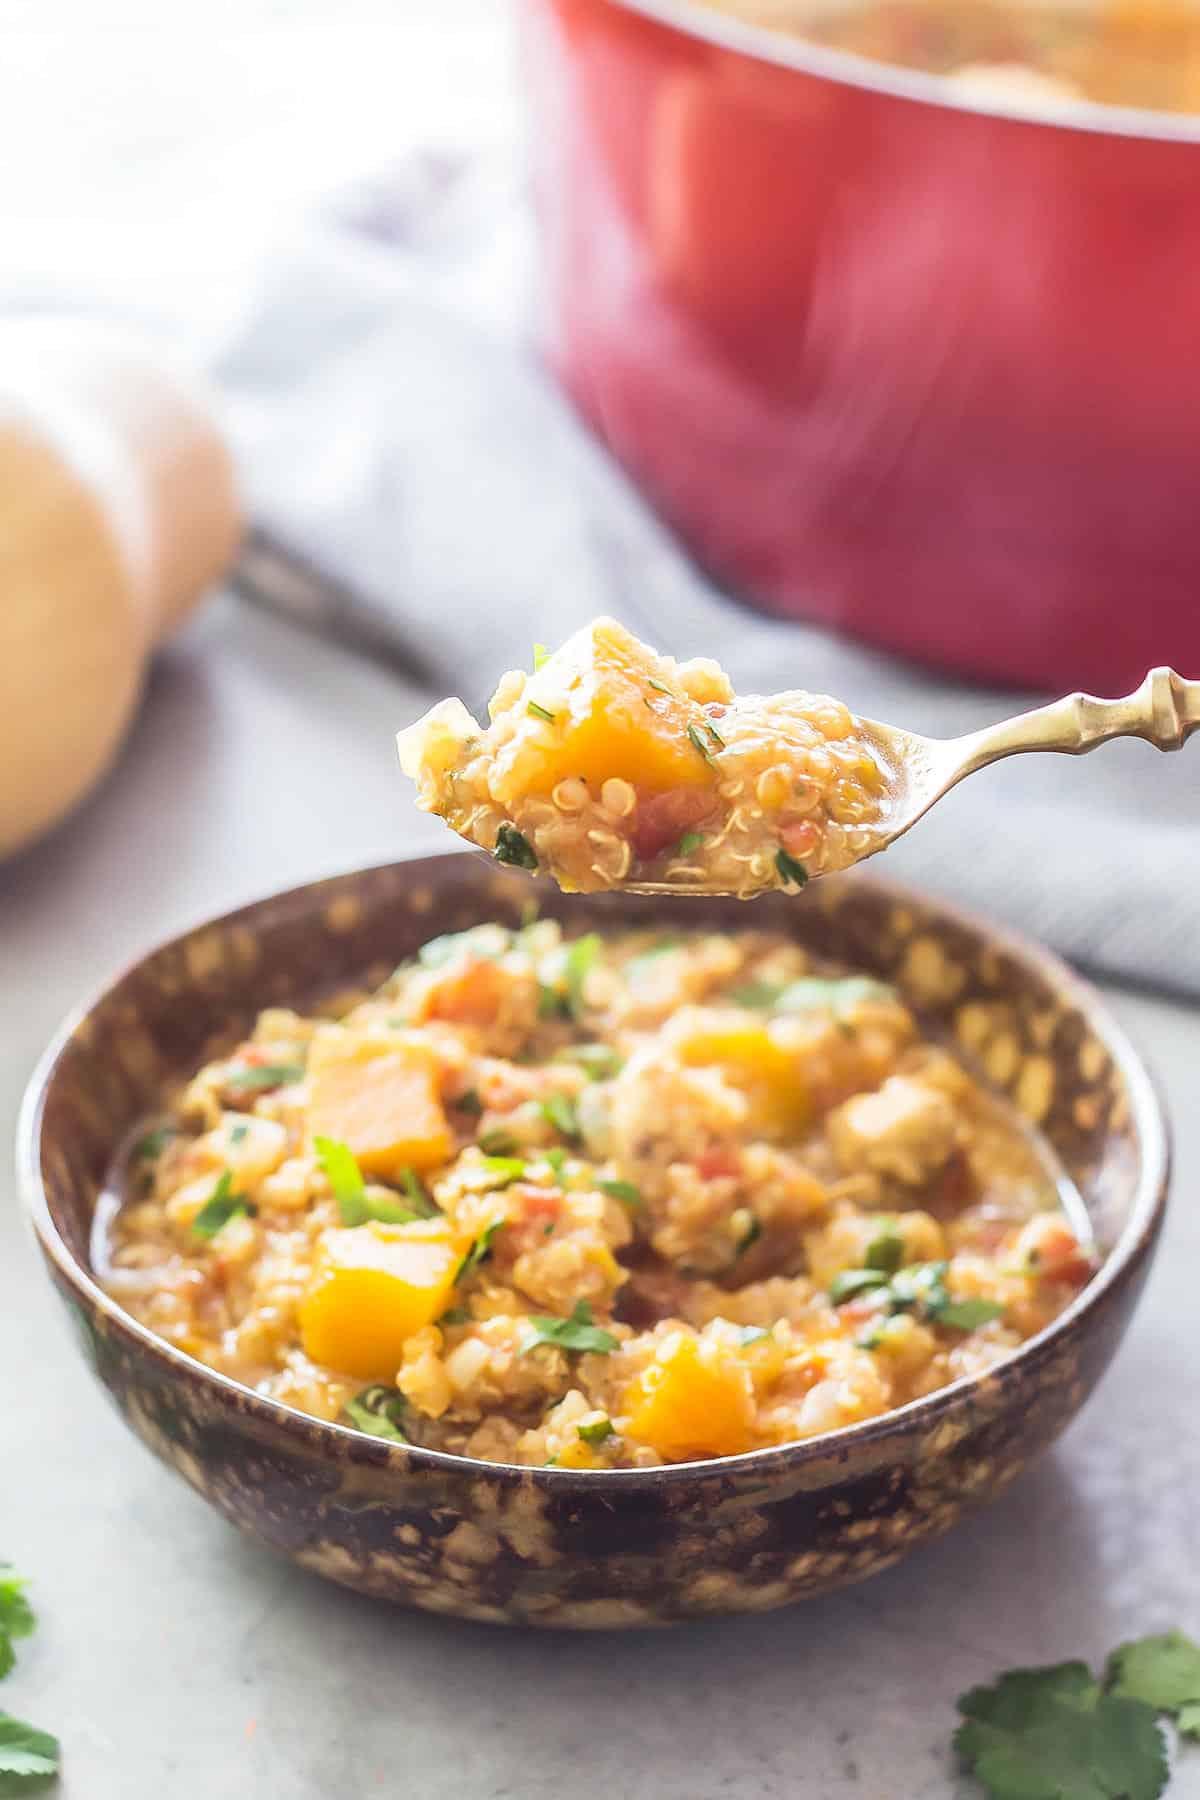 Instant Pot Butternut Squash Stew